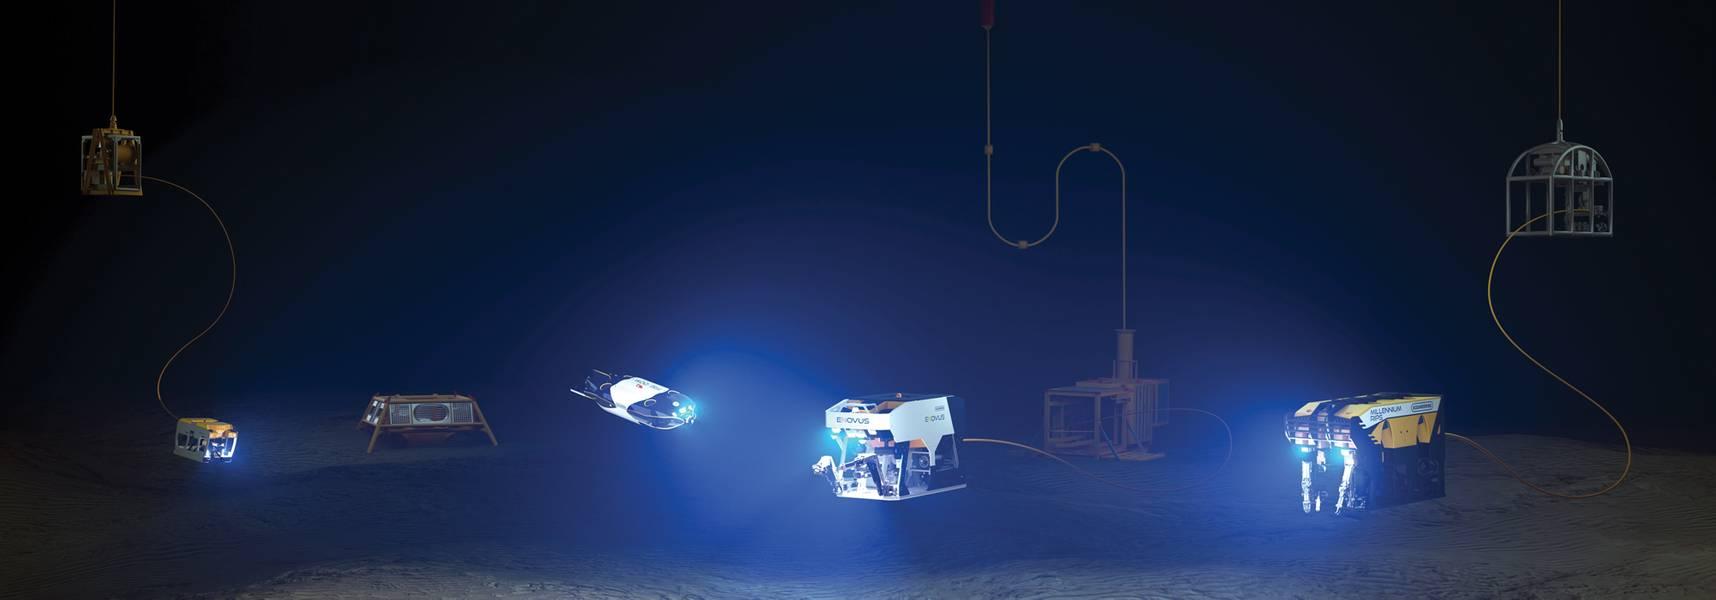 Oceaneeringの次世代車FreedomとE-ROVを含むROVラインナップ。 Oceaneering Internationalのご好意により